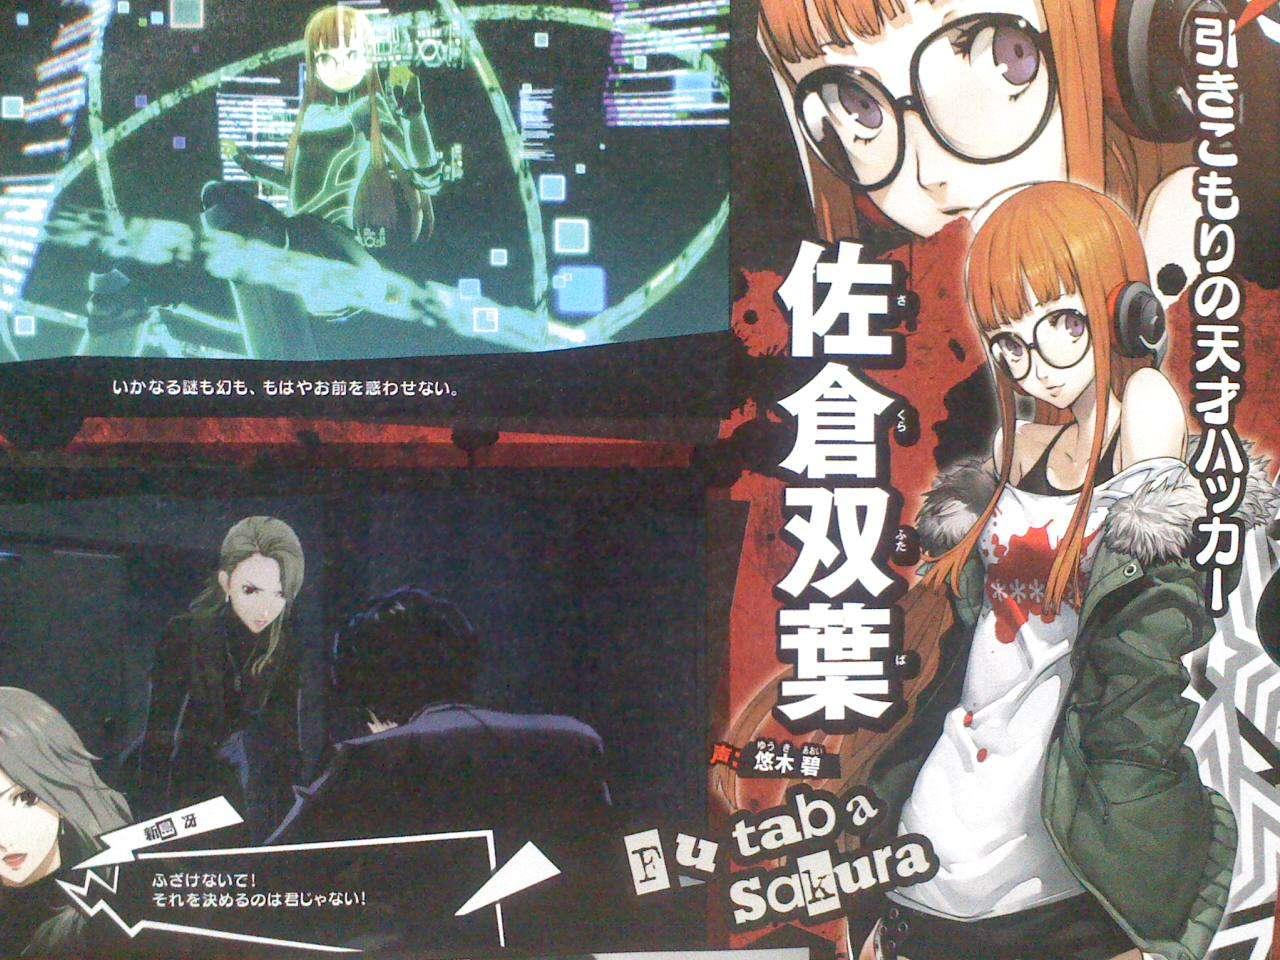 Persona-5-Famitsu-Scan-2.jpg